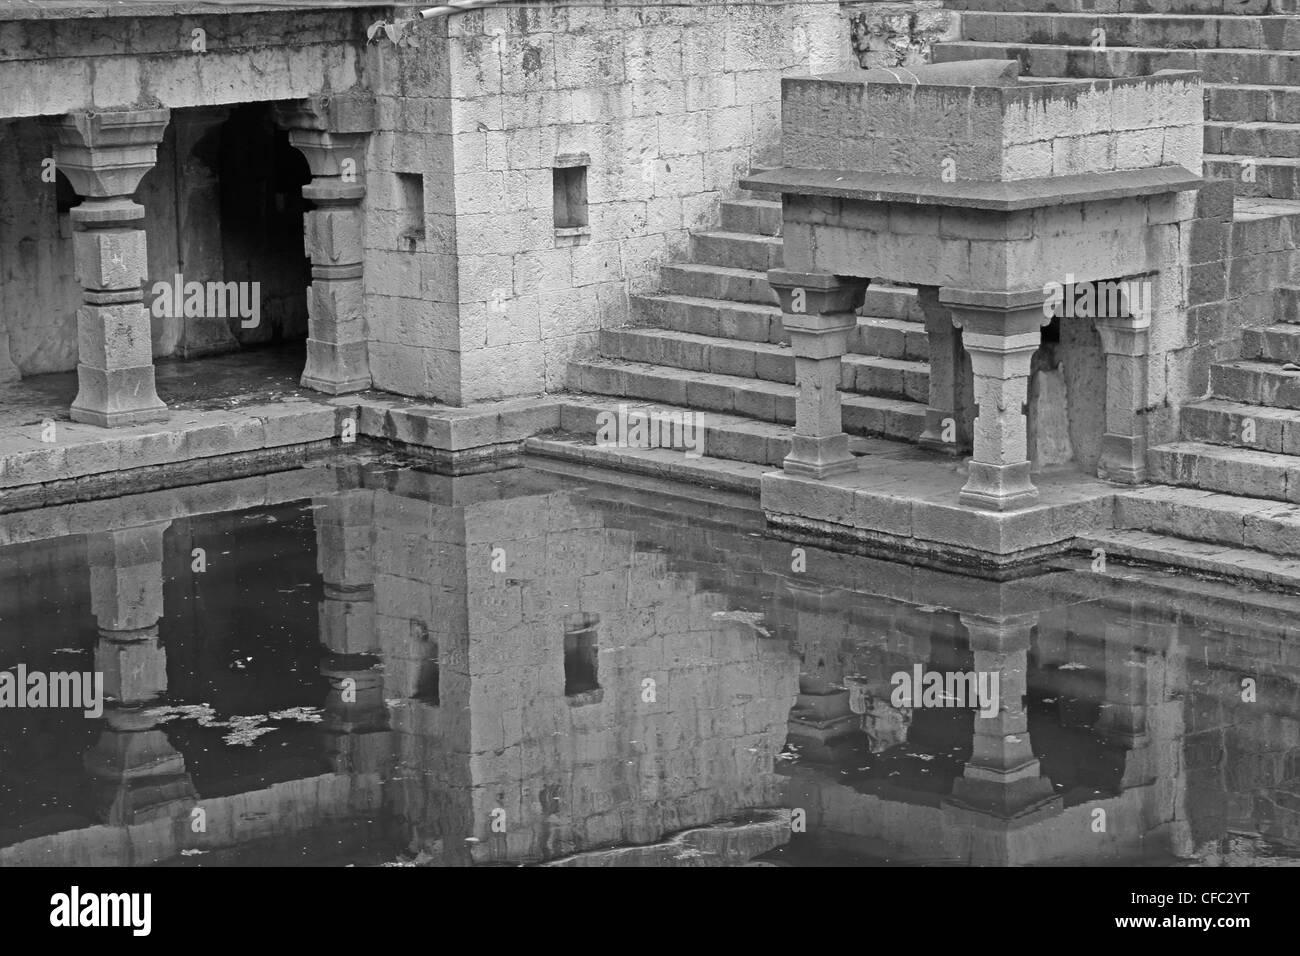 The Holy, Ancient Lord Shiva Temple, Siddheshwar Temple, Rajgurunagar, Khed, Maharashtra, India - Stock Image